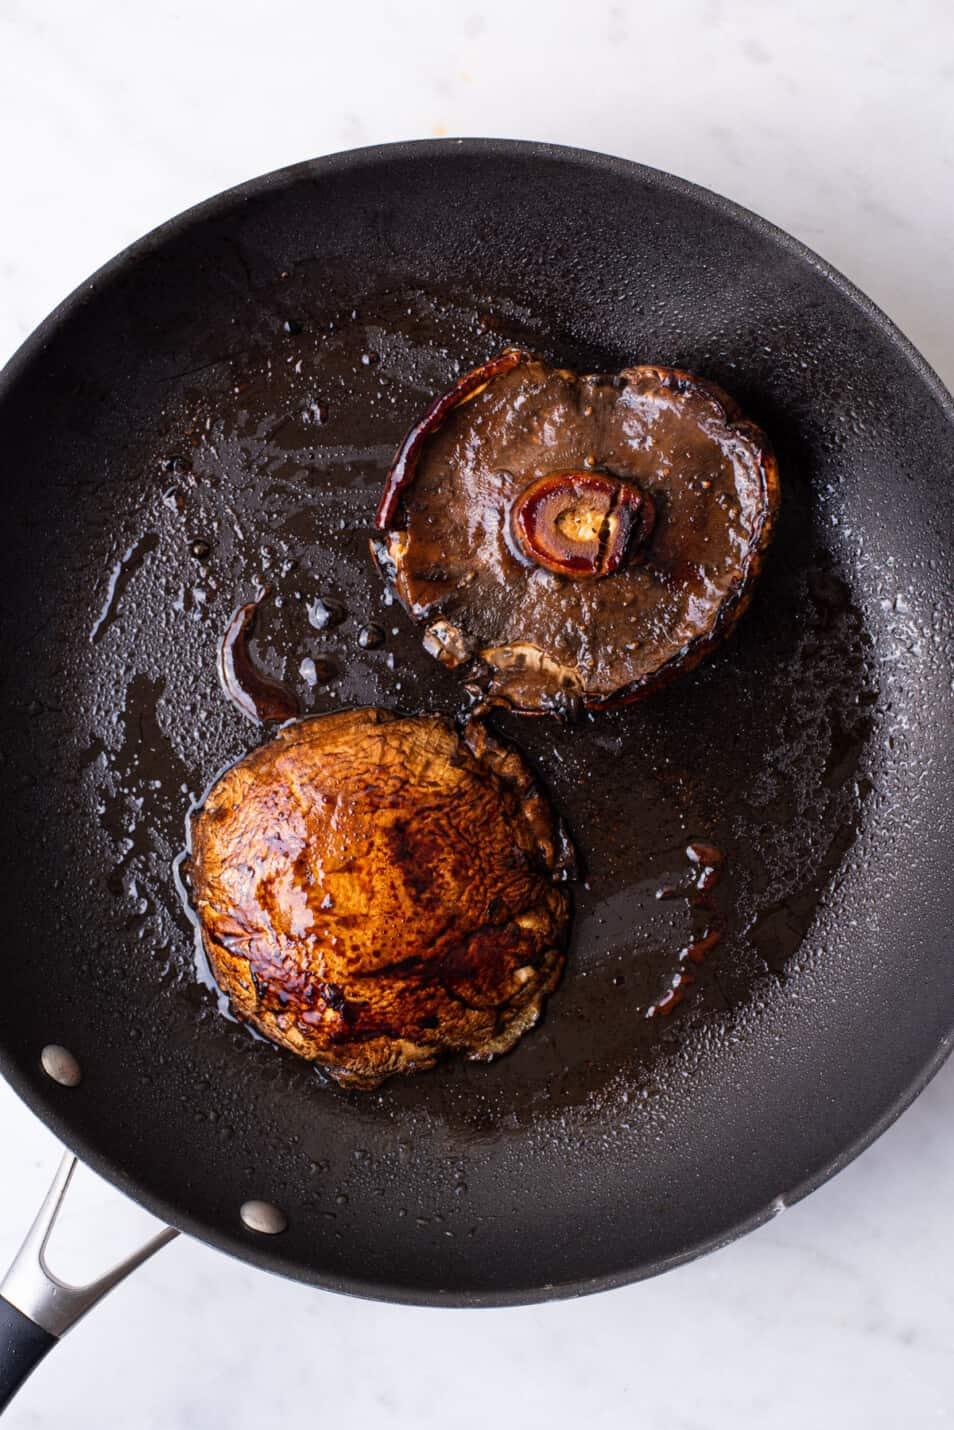 Balsamic portobello mushrooms, seared in a skillet.